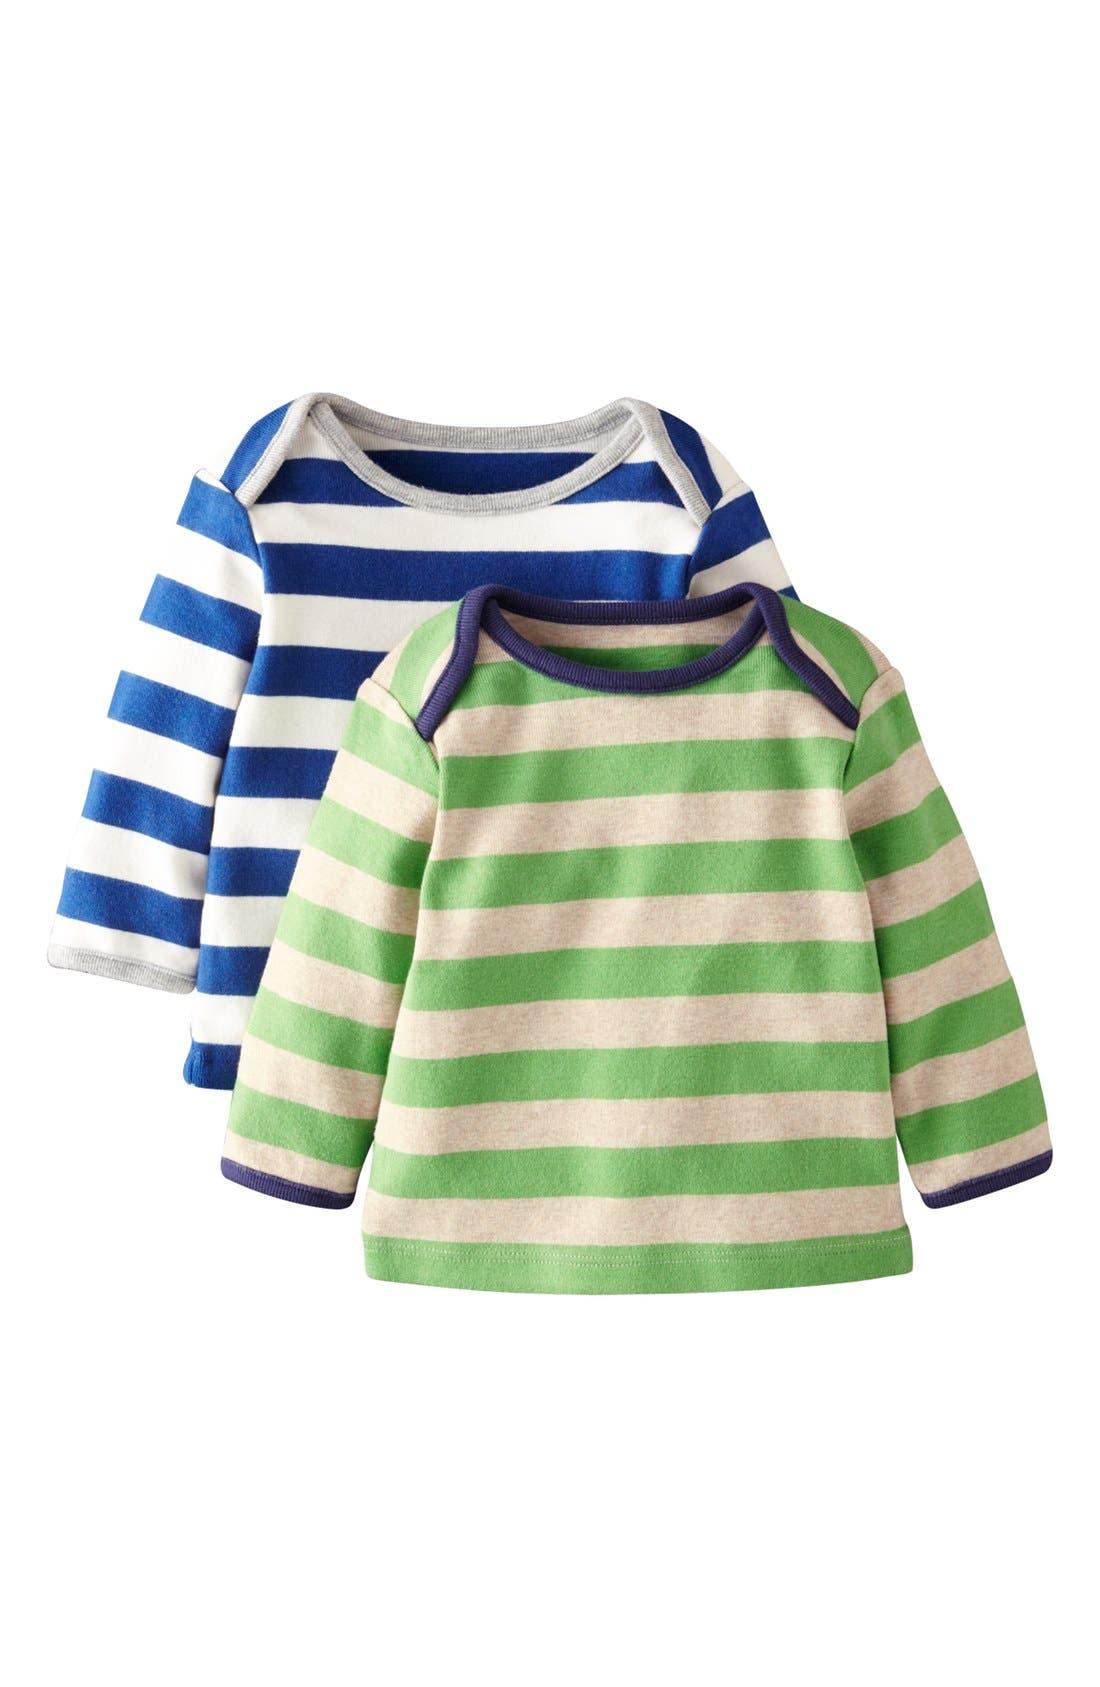 Alternate Image 1 Selected - 'Stripy' T-Shirt (2-Pack) (Baby Boys)